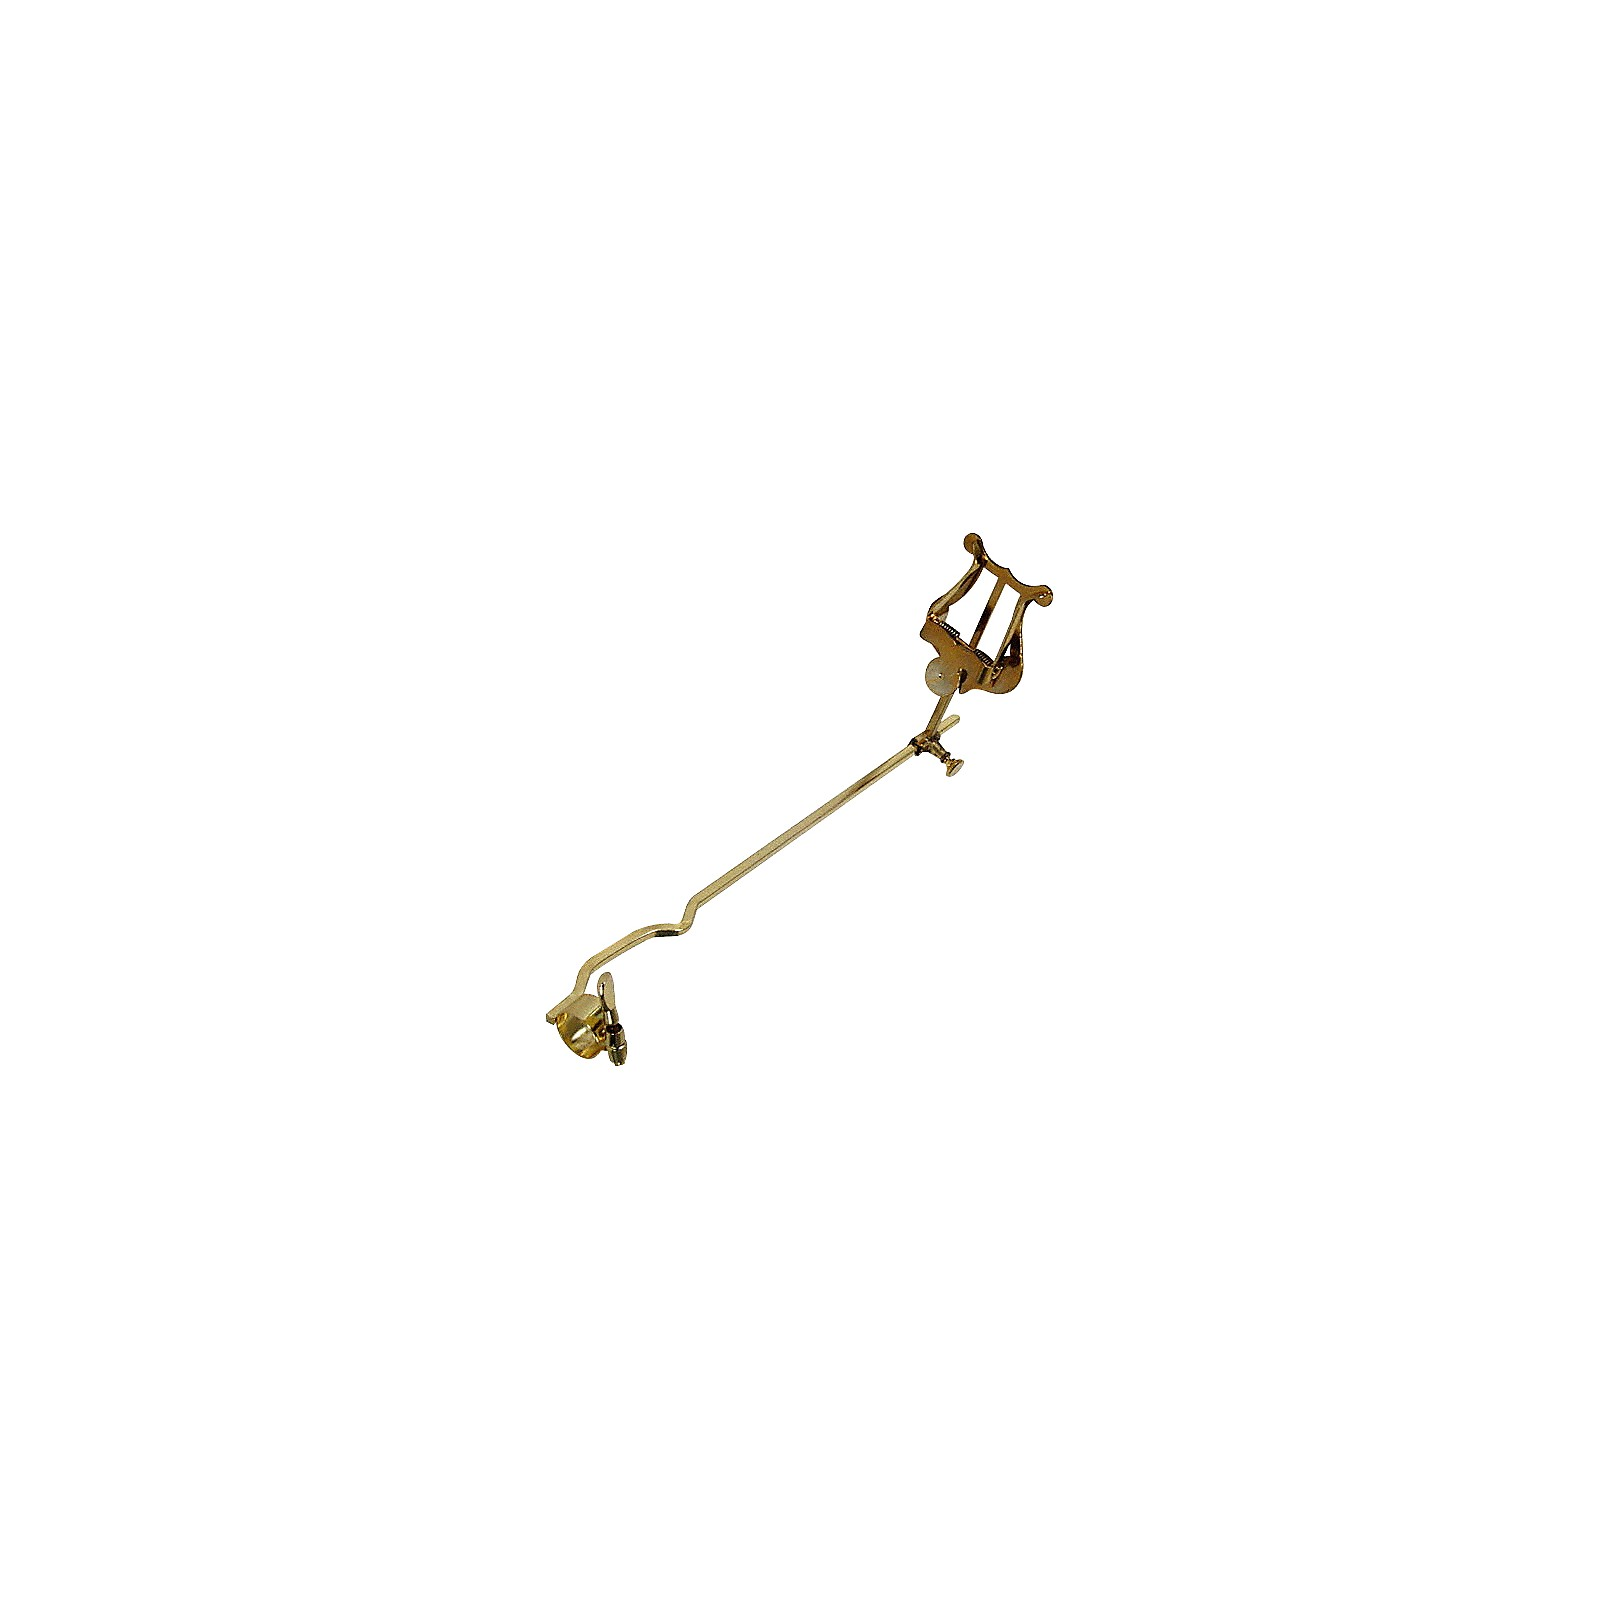 Standard Large Bore Trombone Marching Lyre